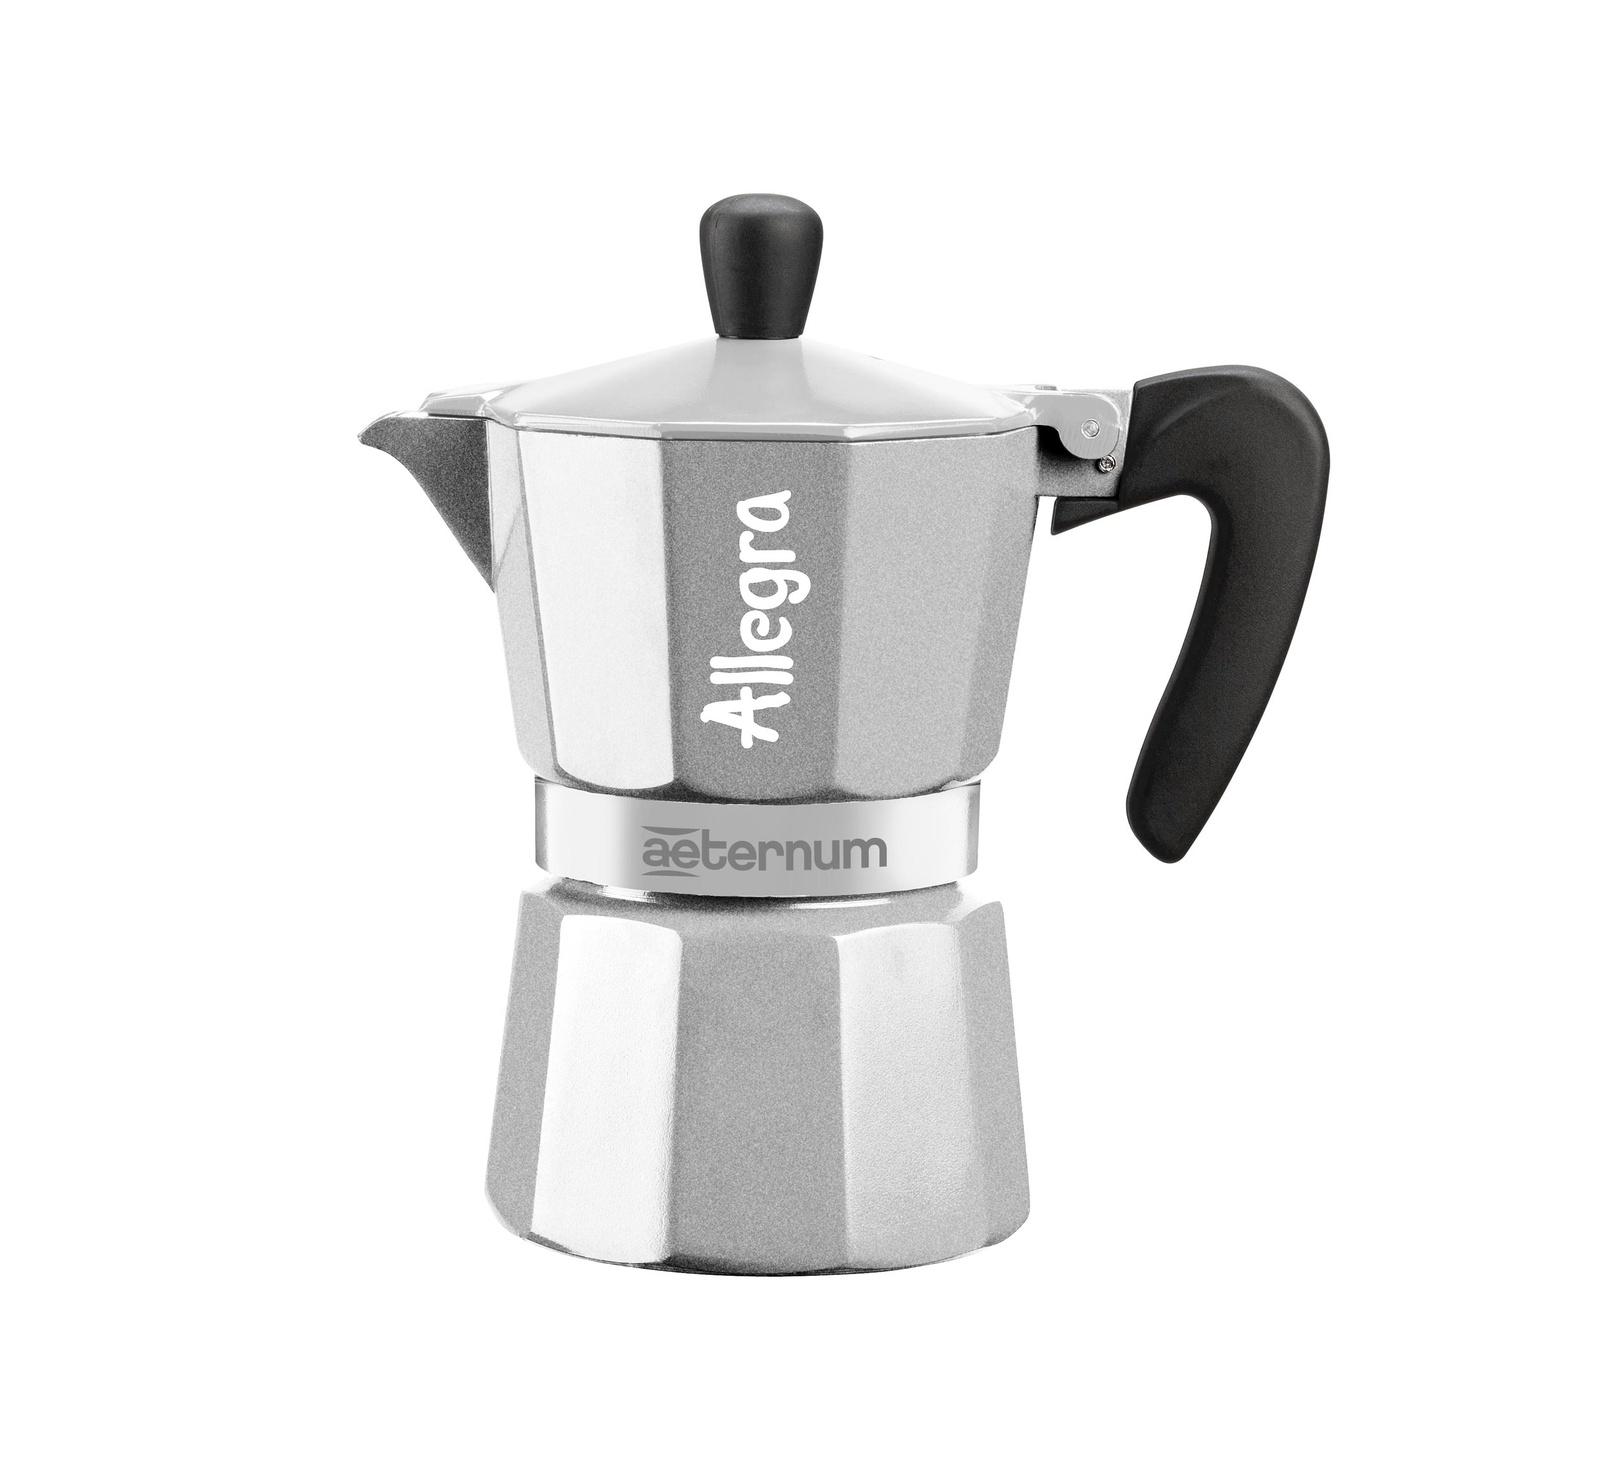 Гейзерная кофеварка Bialetti Aeternum Allegra, серый металлик кофеварка гейзерная bialetti aeternum elegance 6 порций алюминий 6008